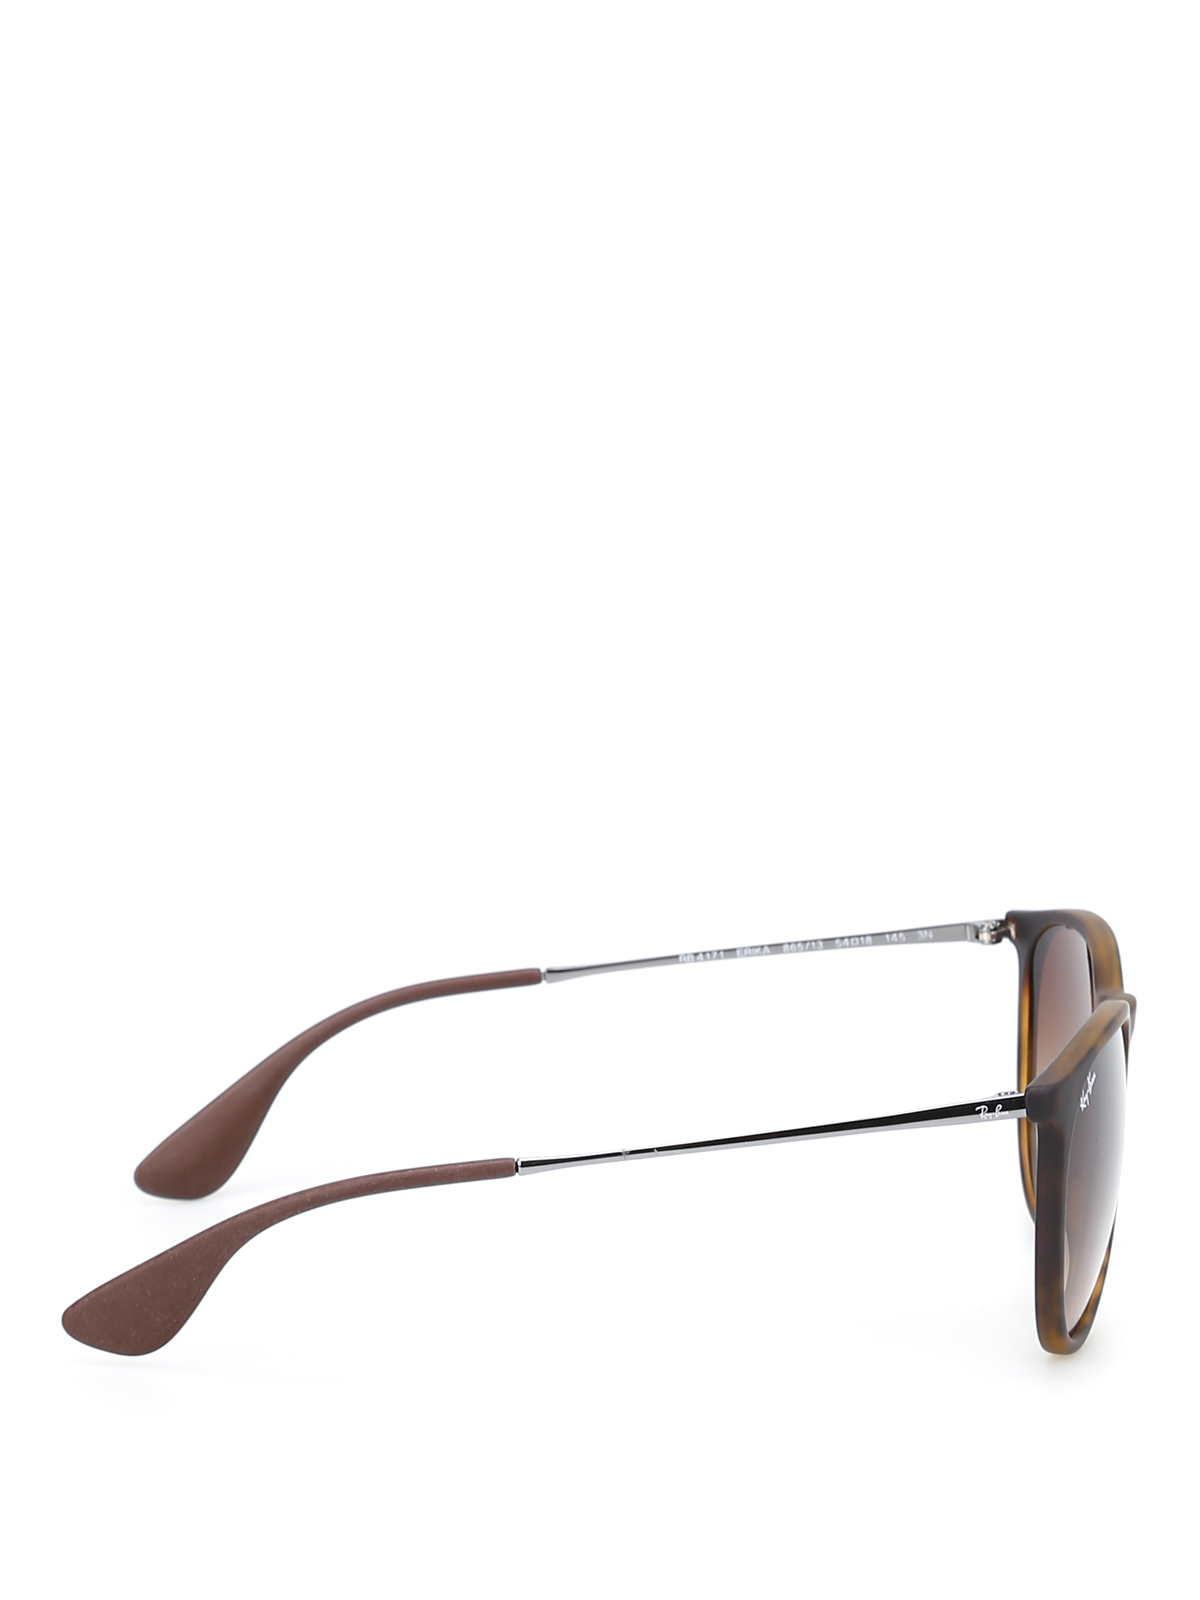 aab8995a73a1 Ray Ban - Erika satinized tortoise sunglasses - sunglasses - RB4171 ...